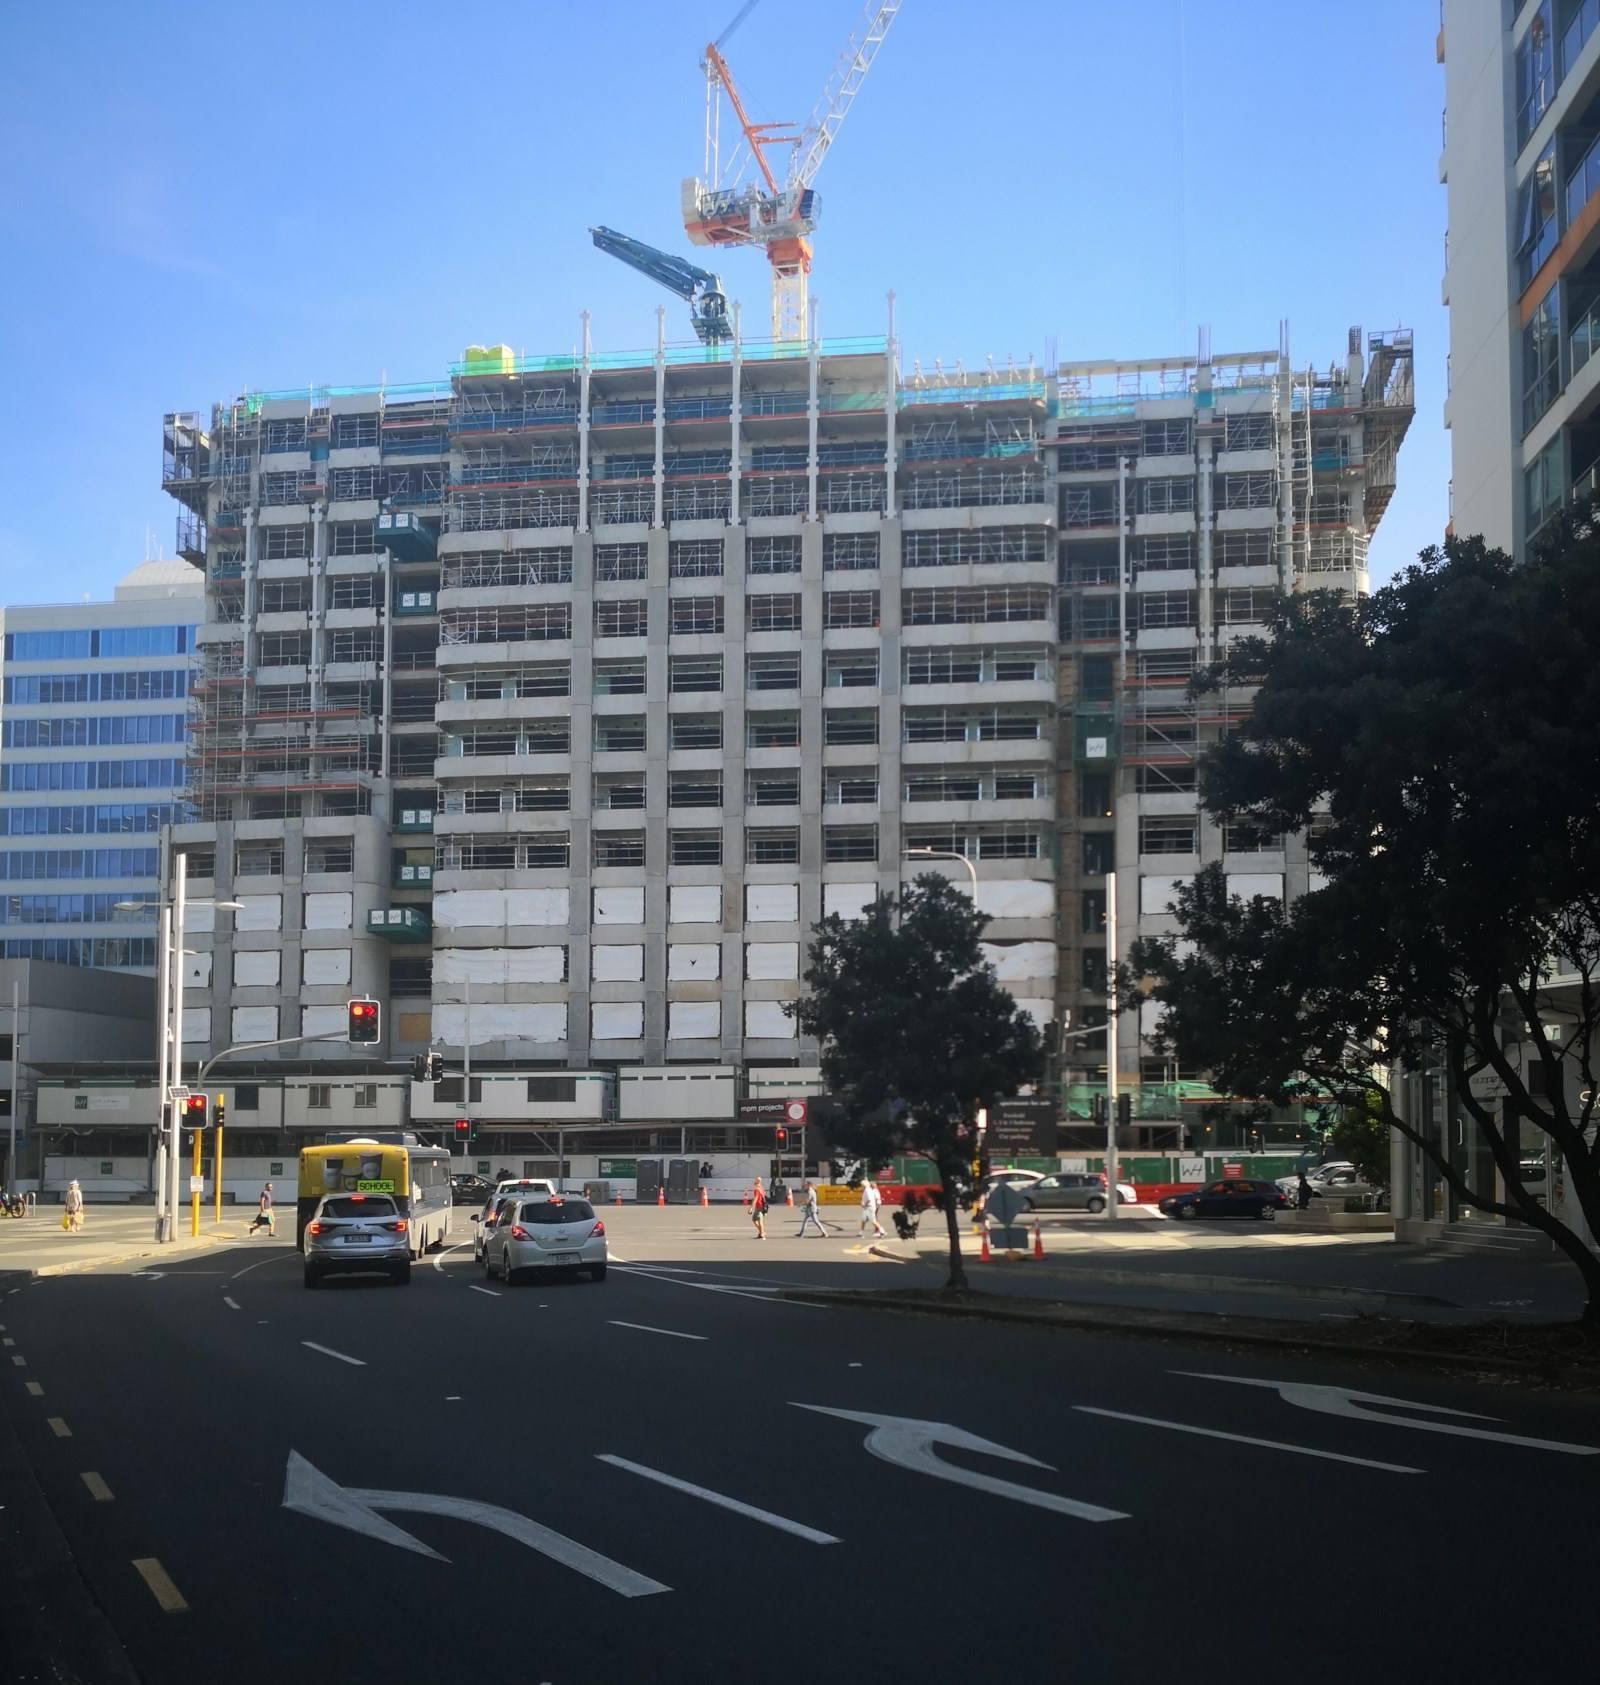 Auckland Central 1房 全新单卧公寓 地段得天独厚 配套一应俱全 亮点多多 置业/投资首选! Brand New One Bedroom - Premium Freehold Location